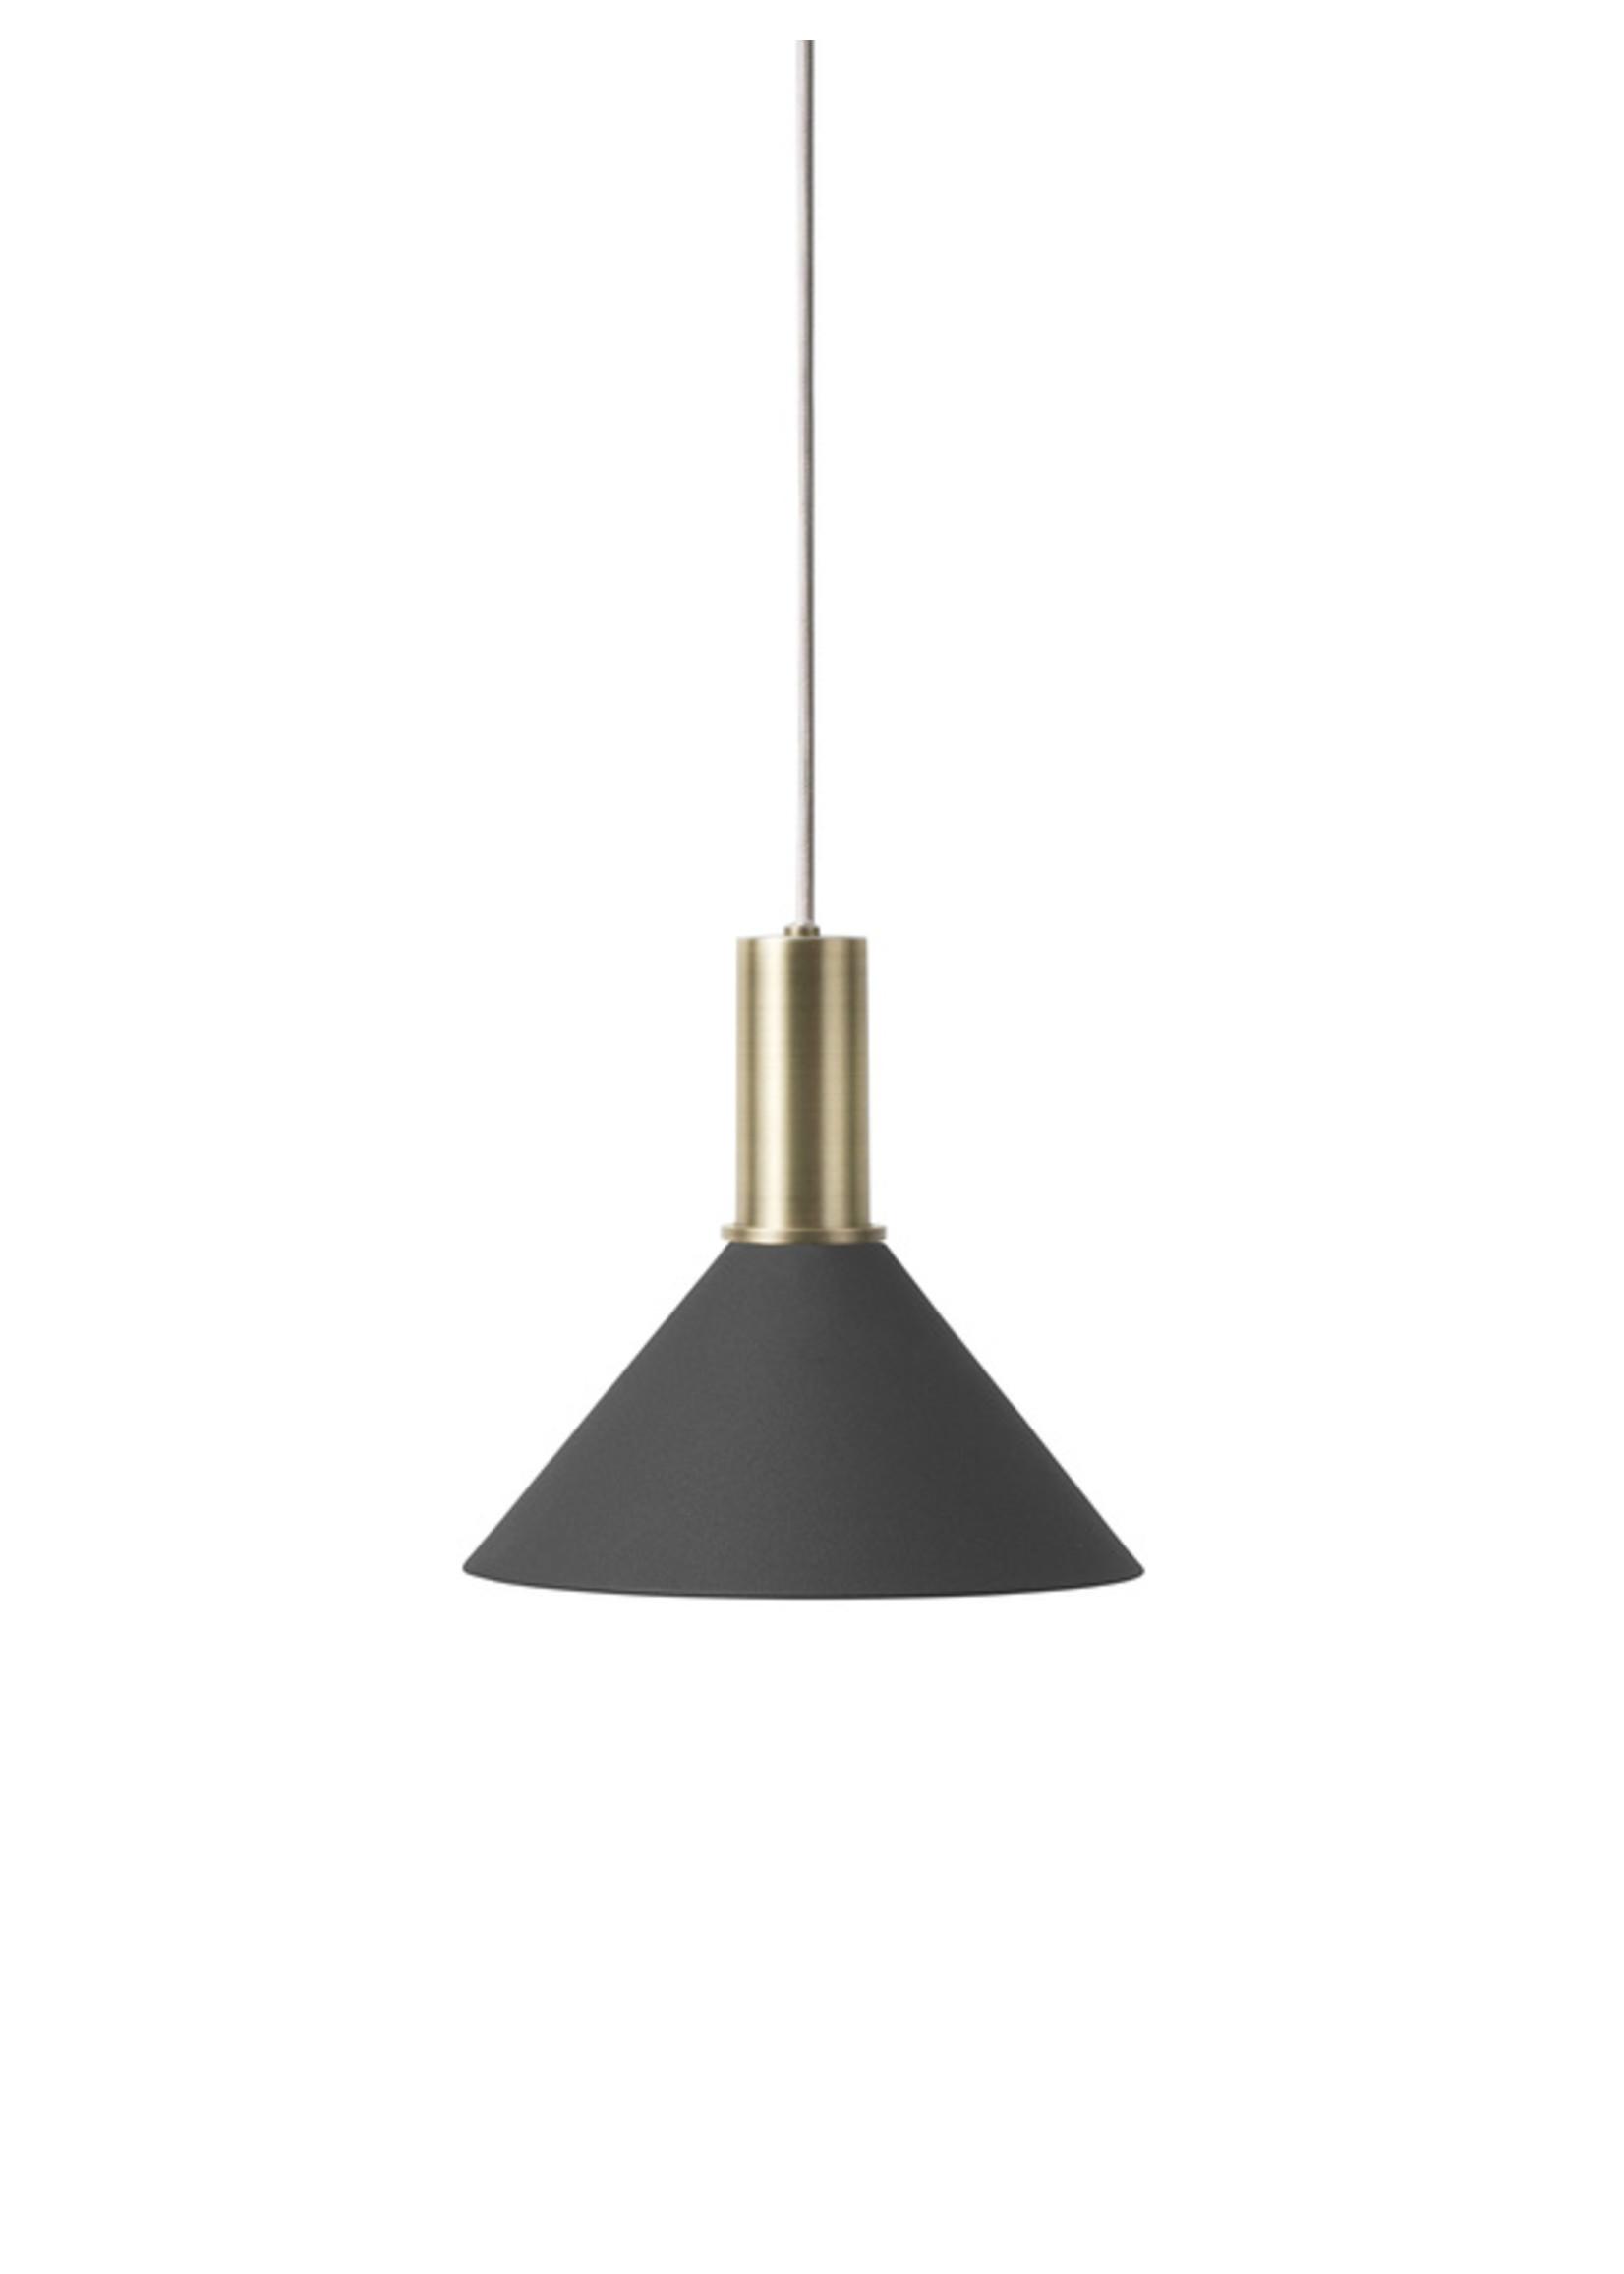 ferm LIVING ferm LIVING Lighting - Cone Shade - Black